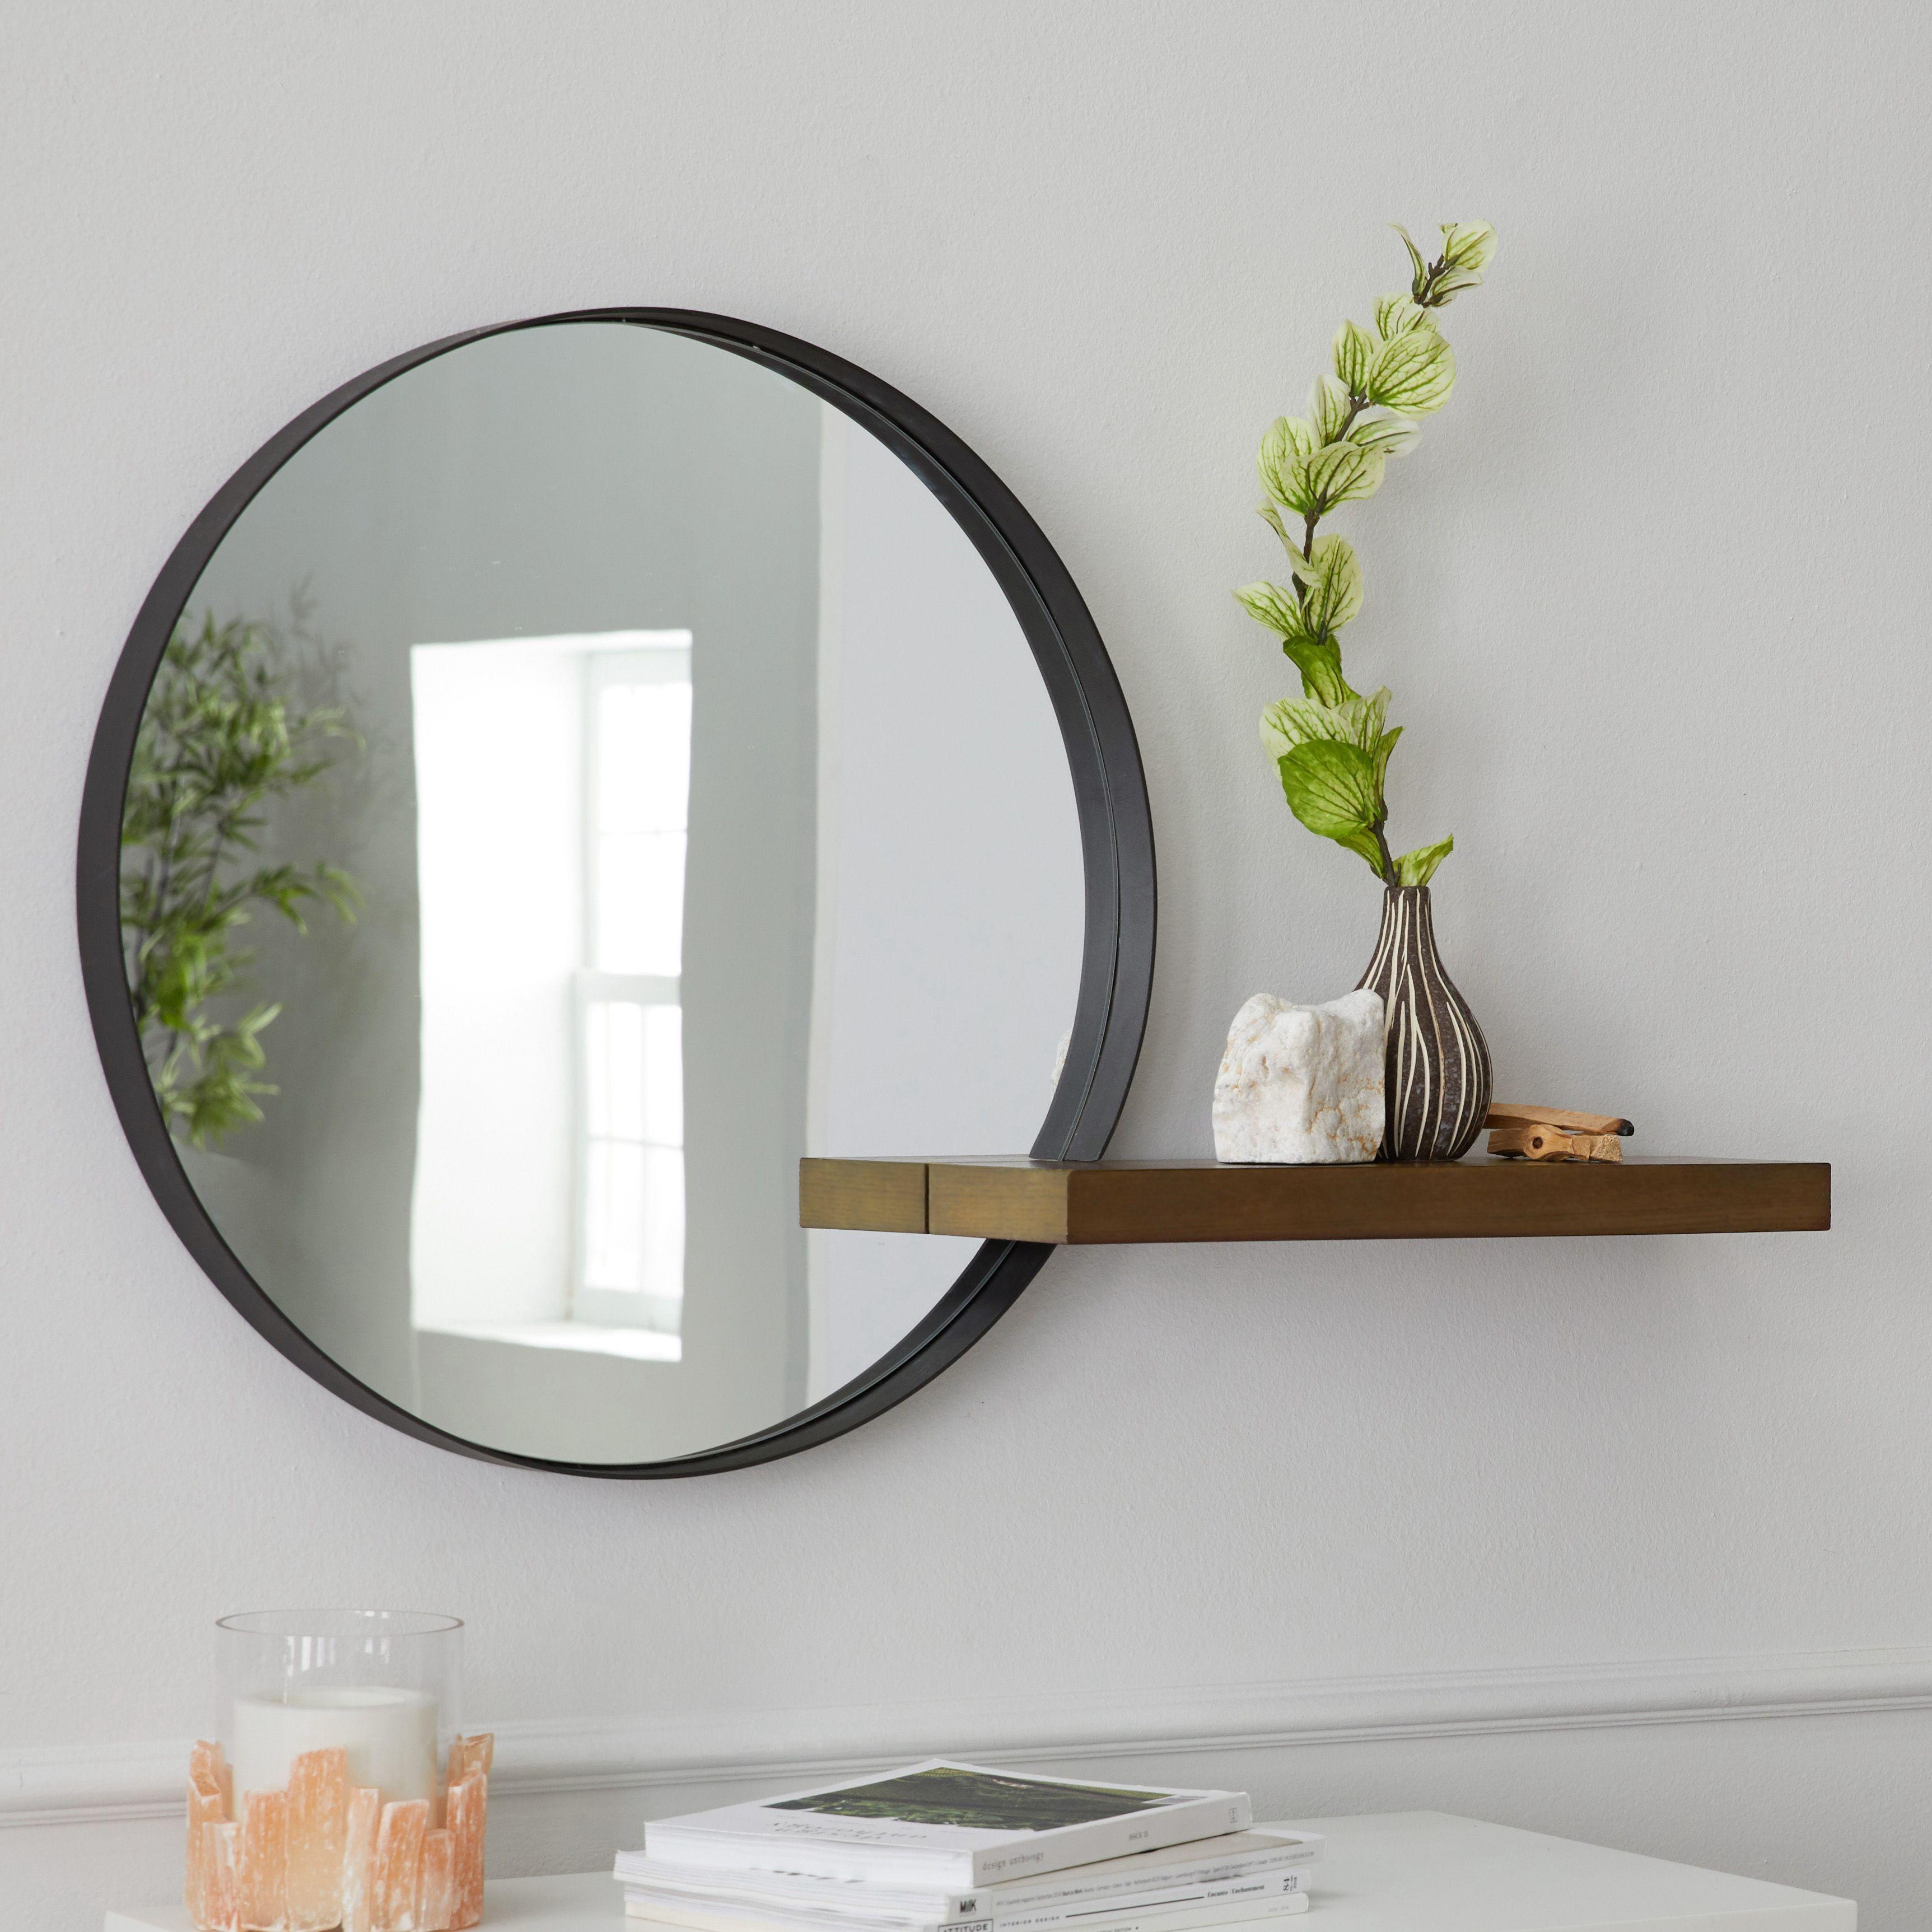 Home Mirror Wall Decor Neutral Bathroom Decor Wood Shelves